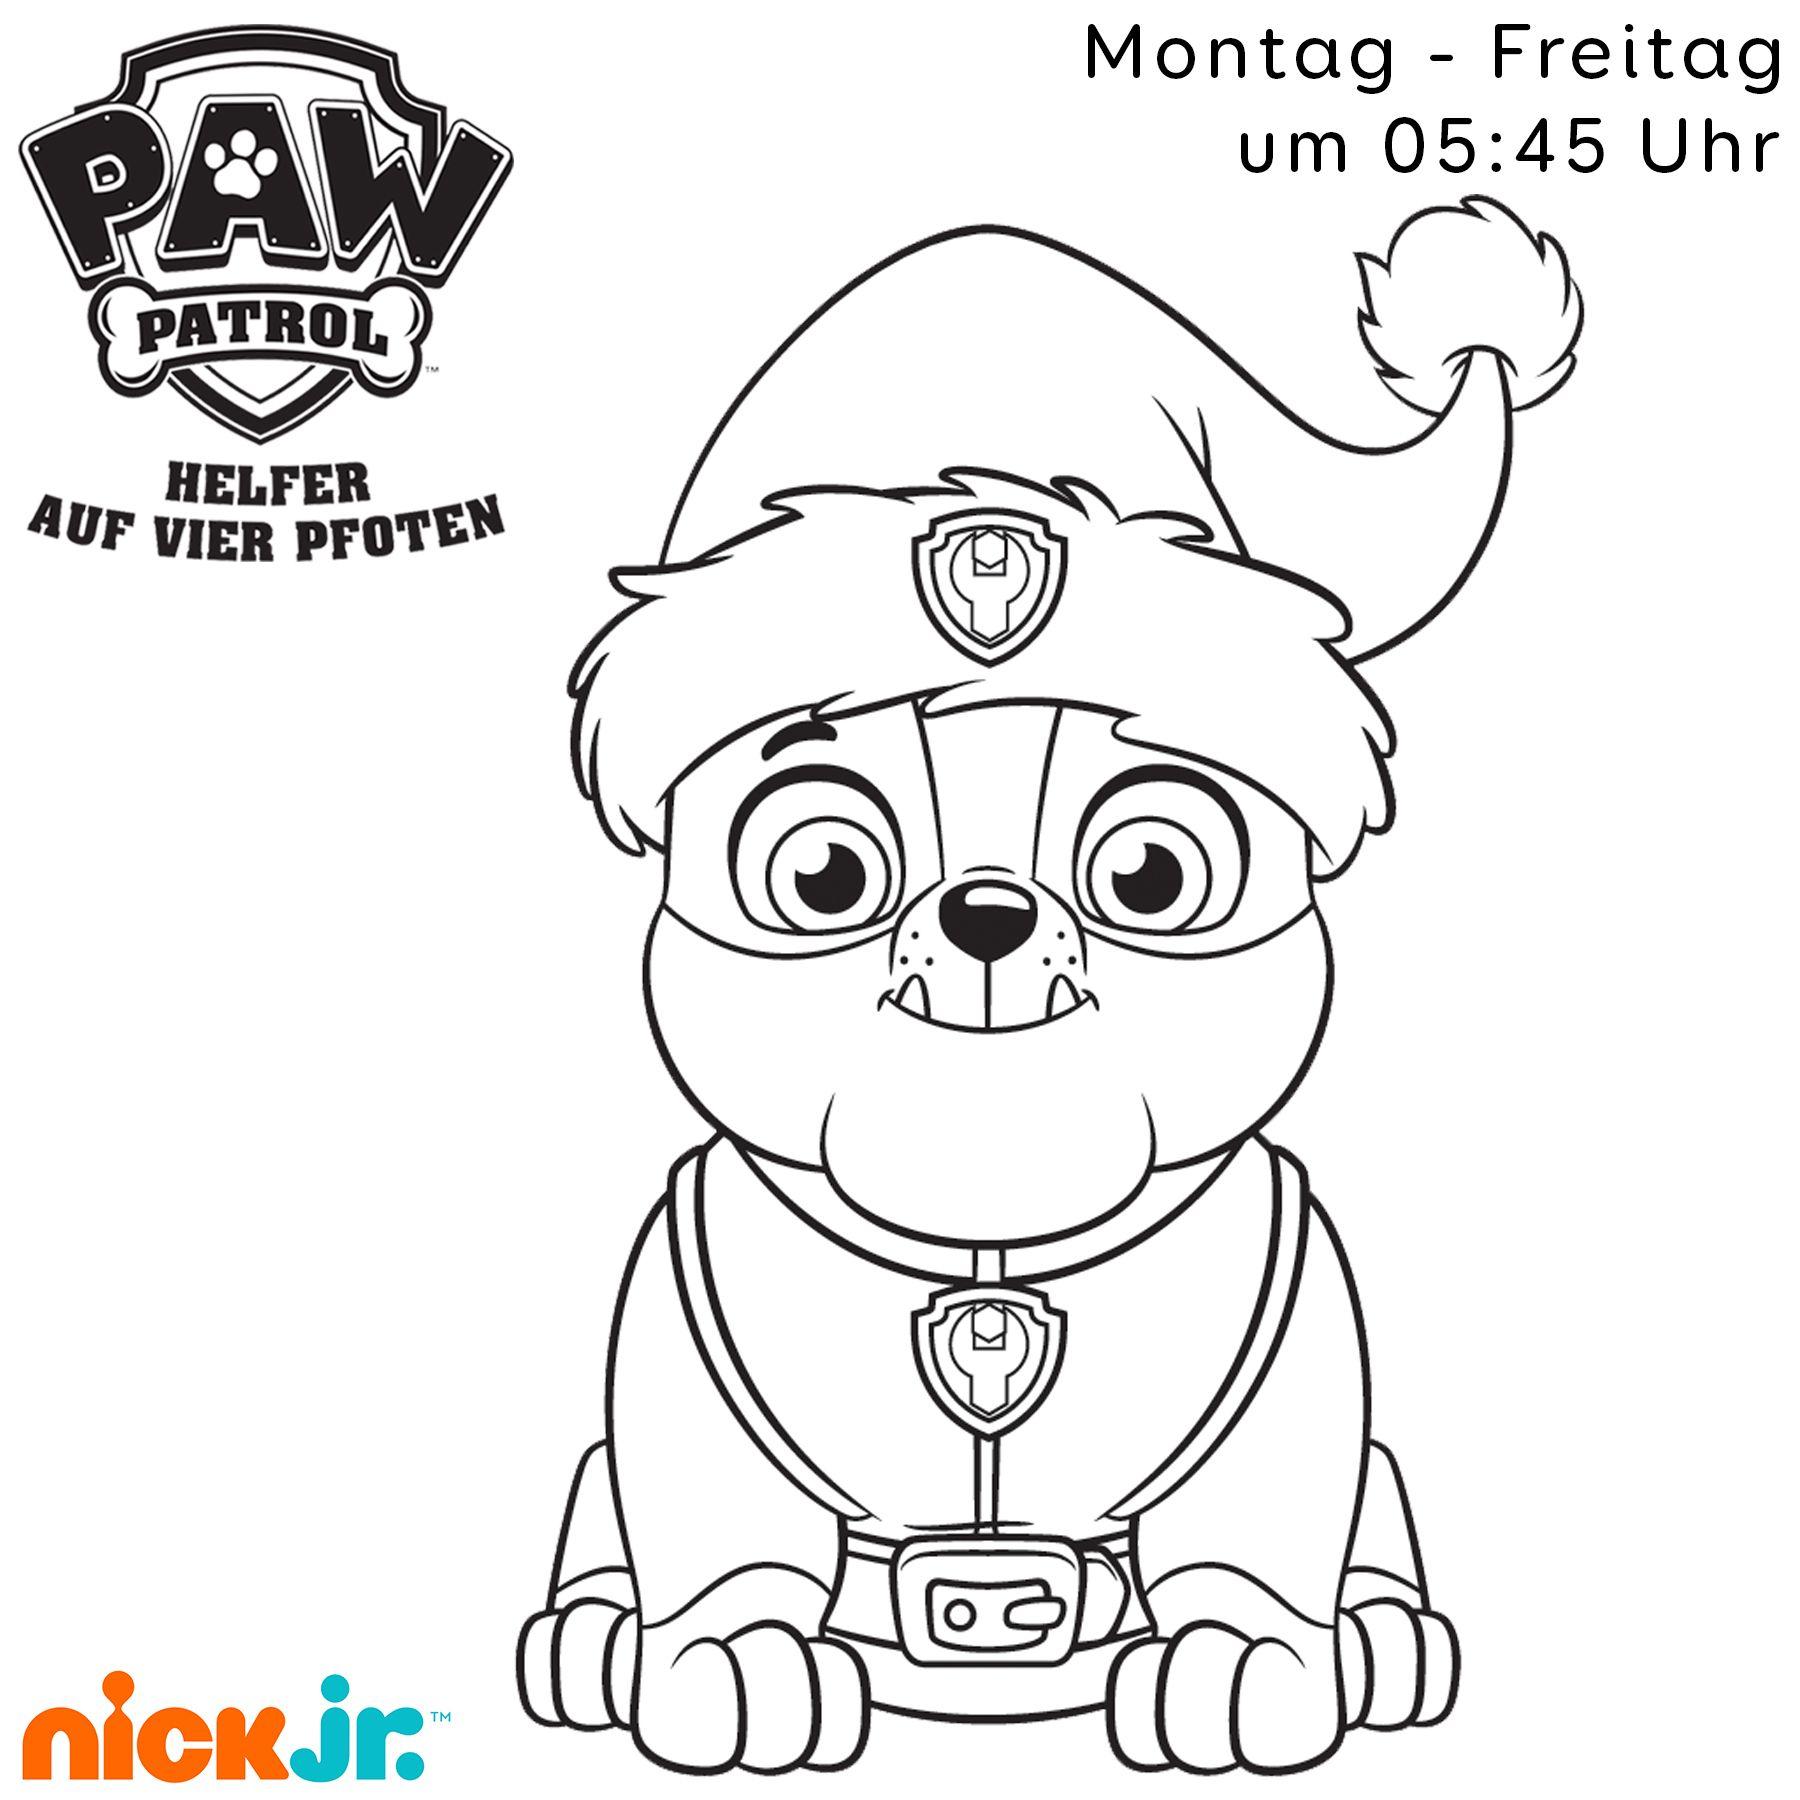 paw patrol gewinnspiel  nickch with images  paw